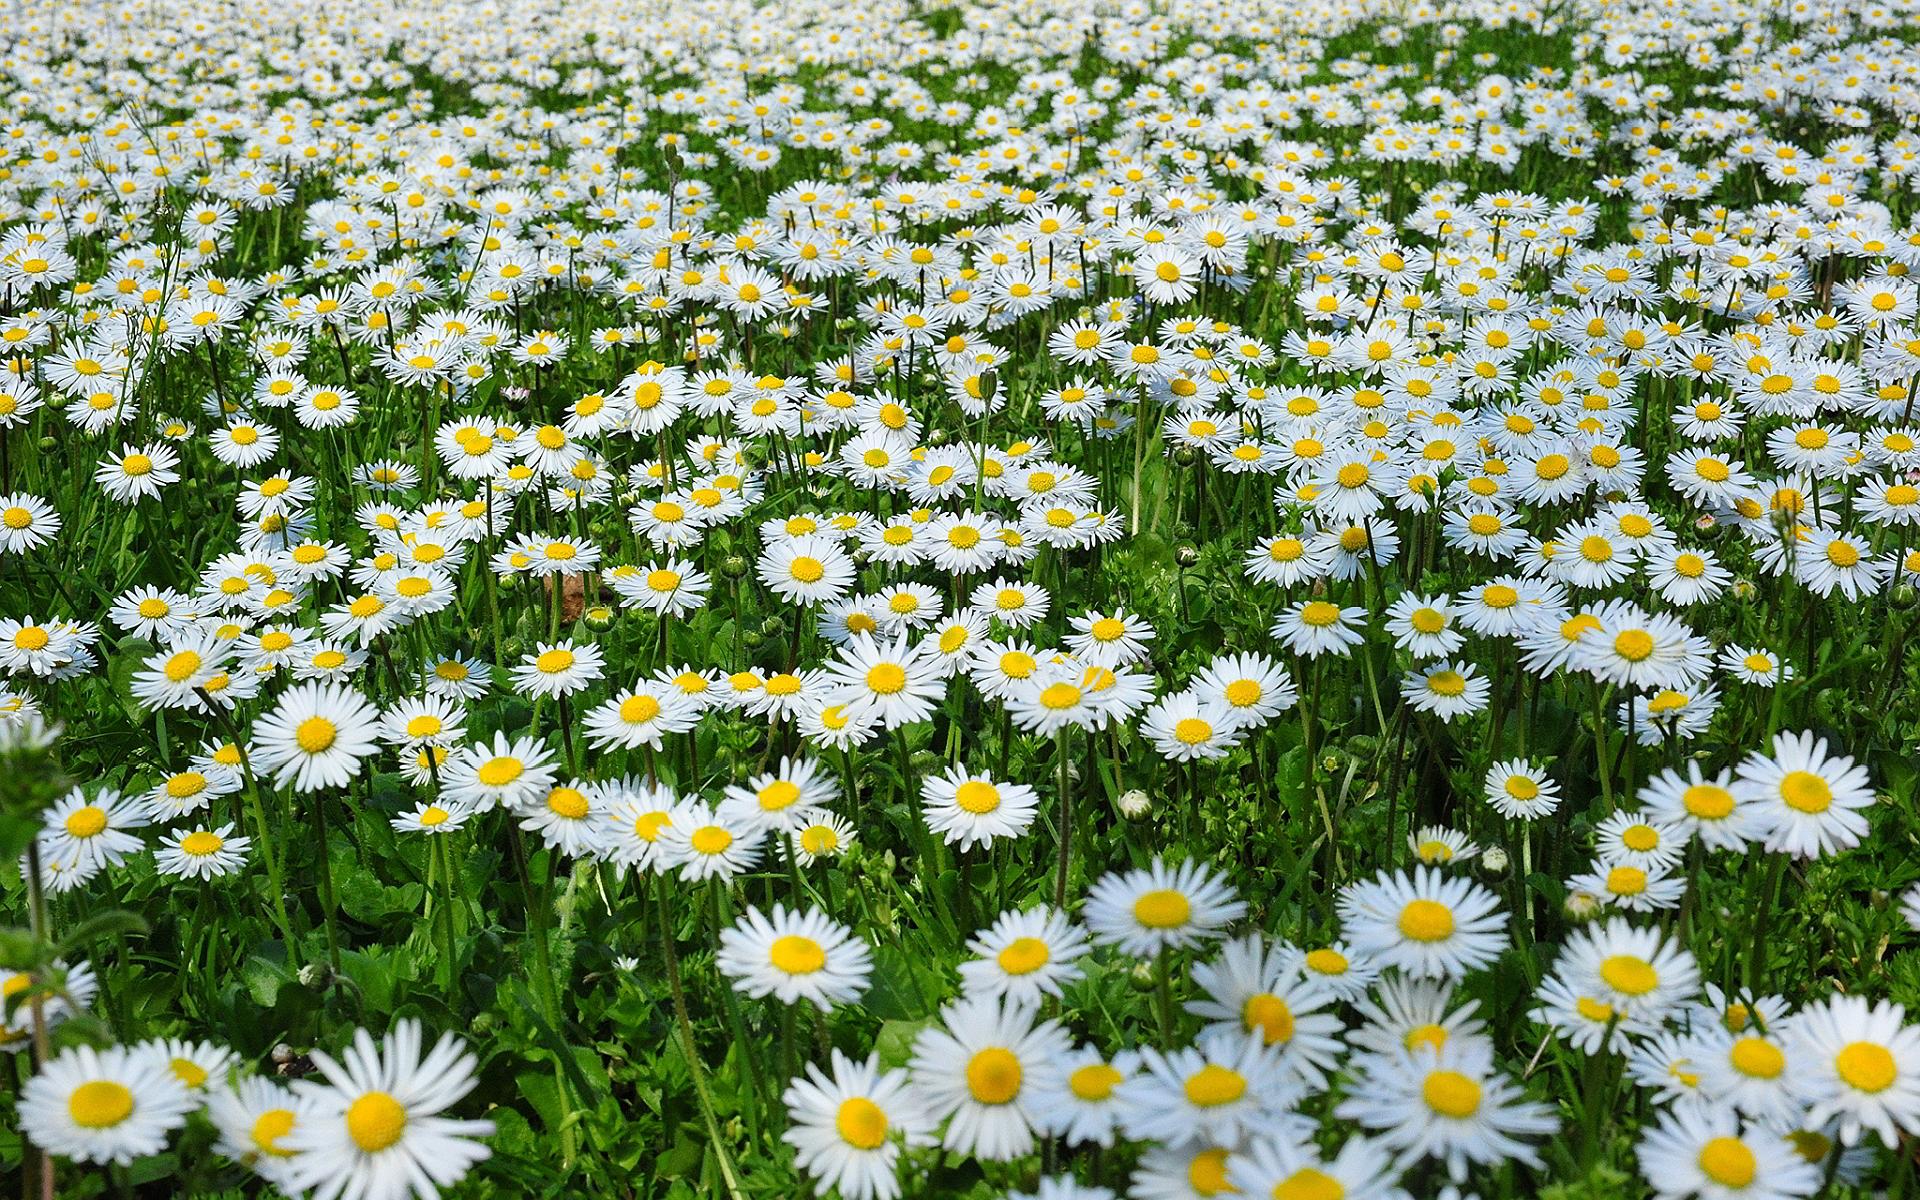 Autumn Love Hd Live Wallpaper Daisies Margherite Hd Desktop Wallpapers 4k Hd